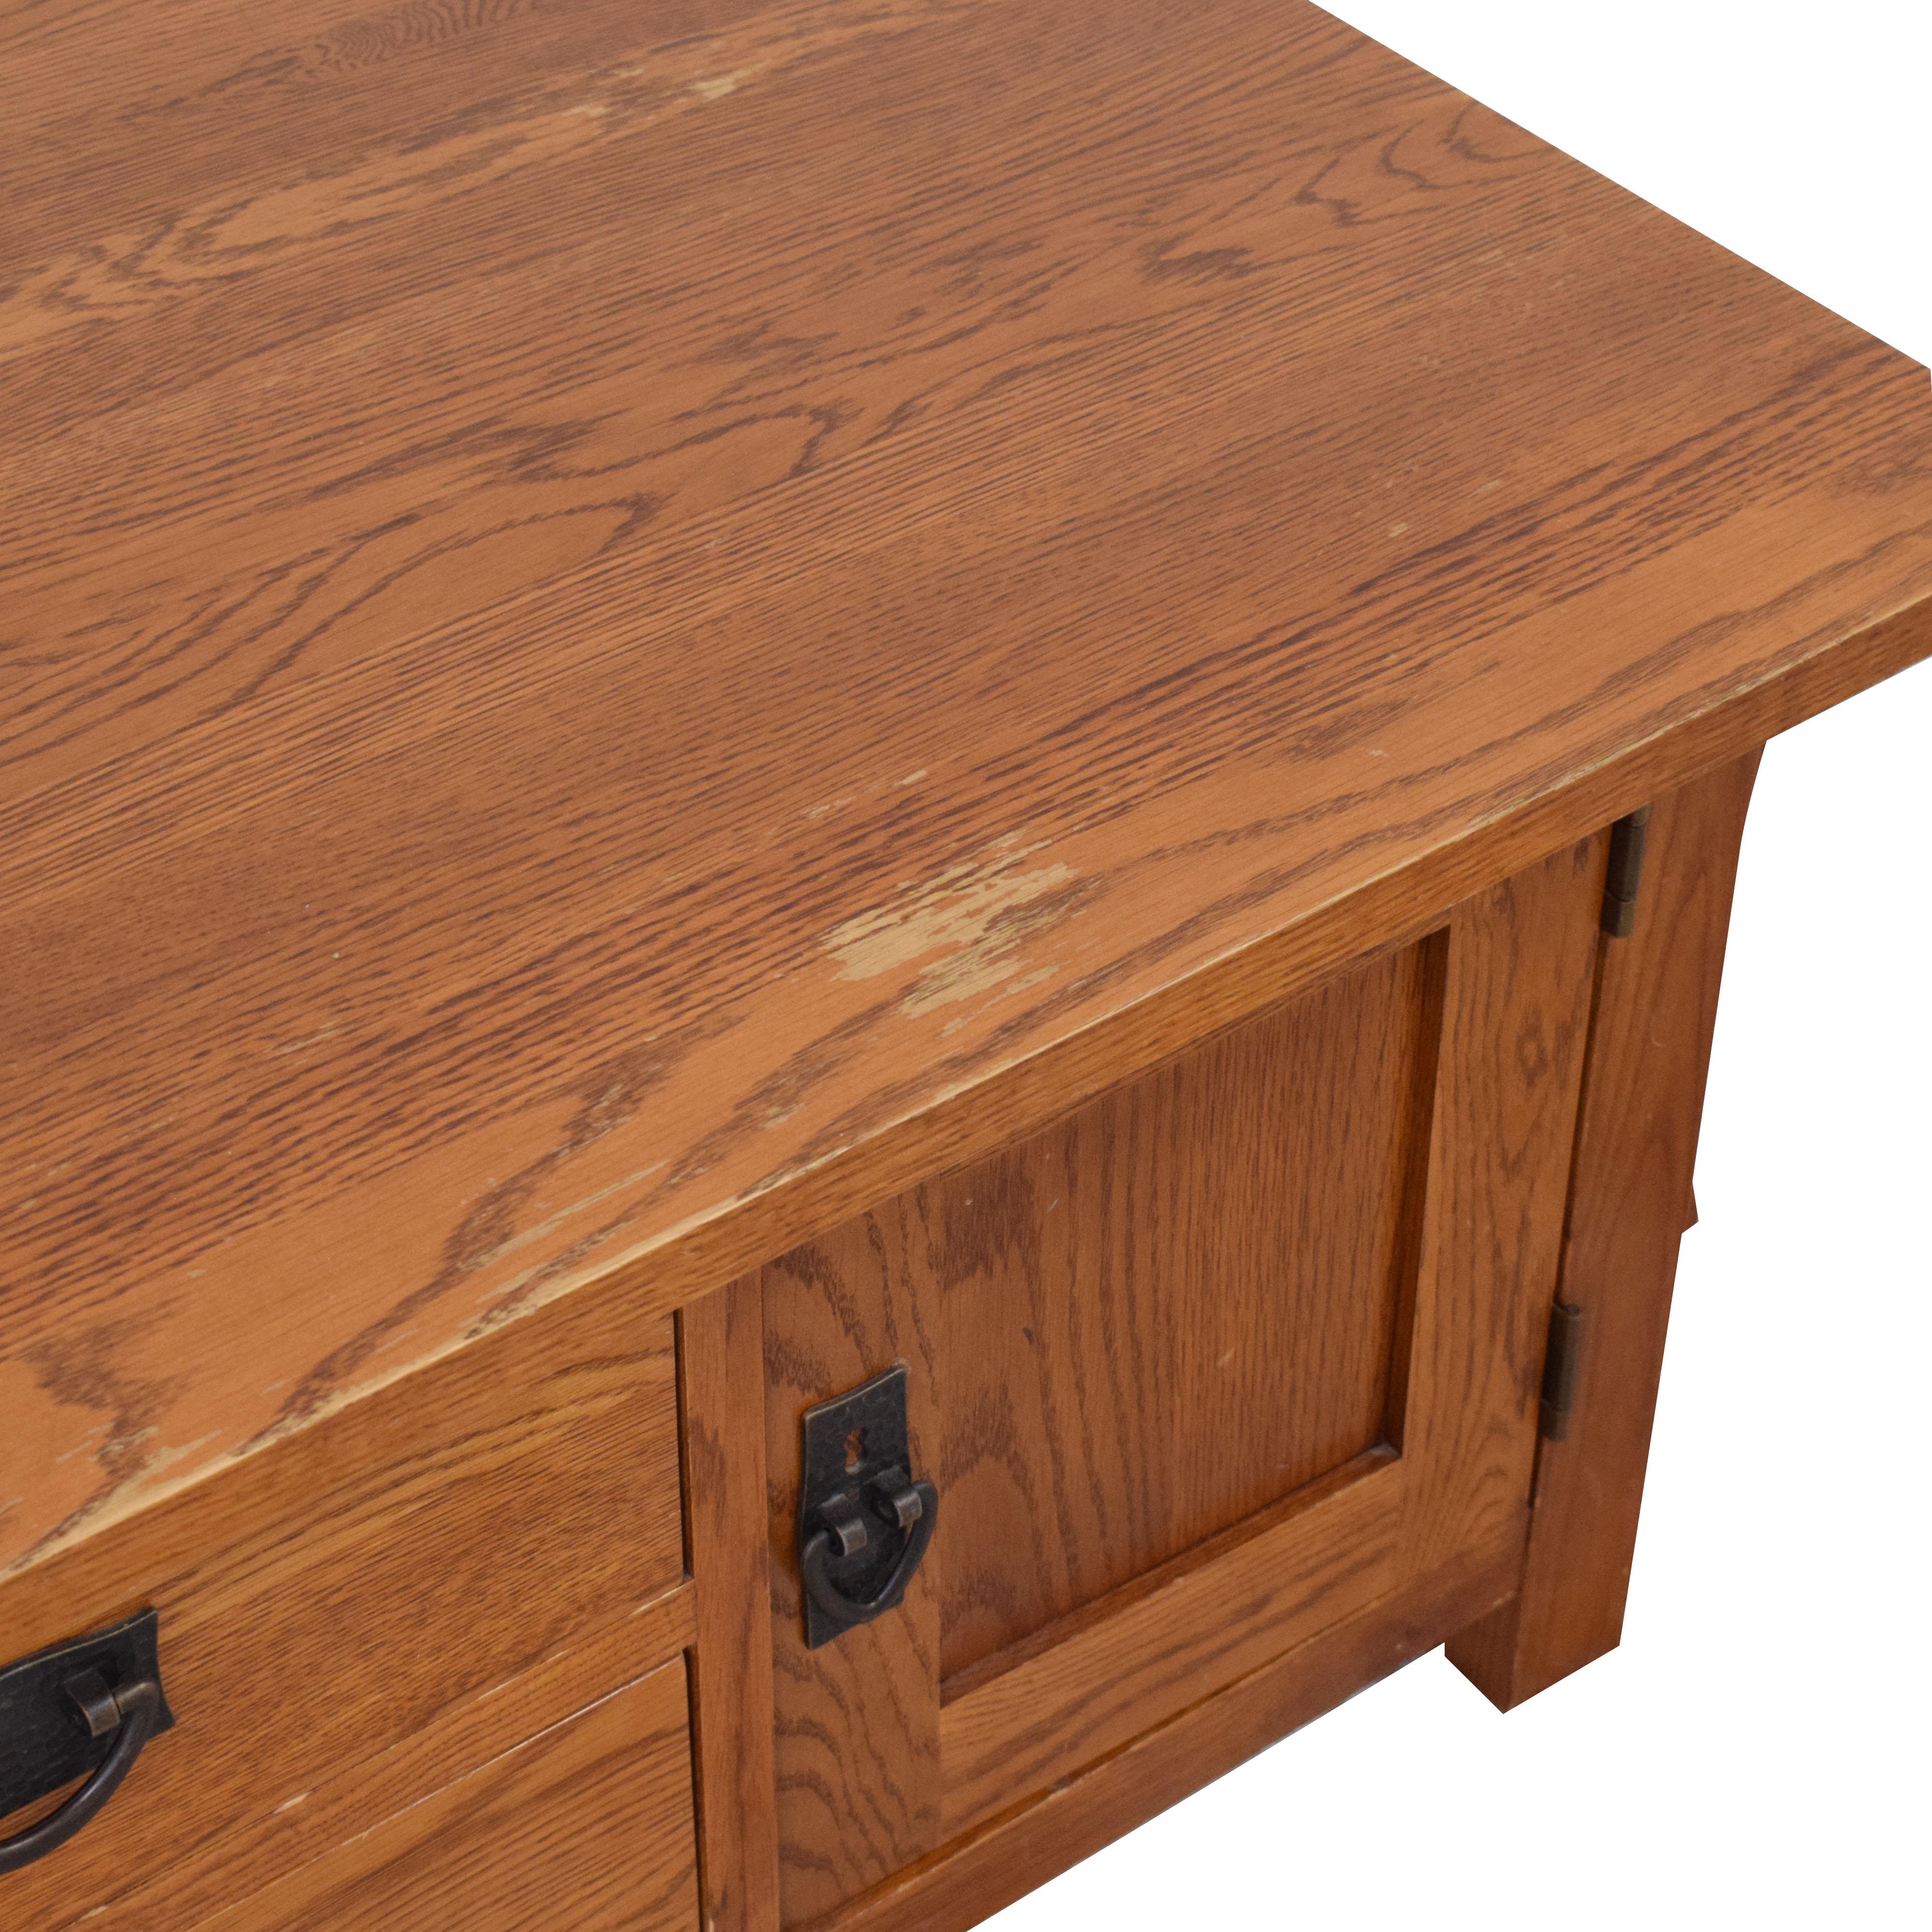 78 Off Kincaid Furniture Kincaid Furniture Coffee Table Tables